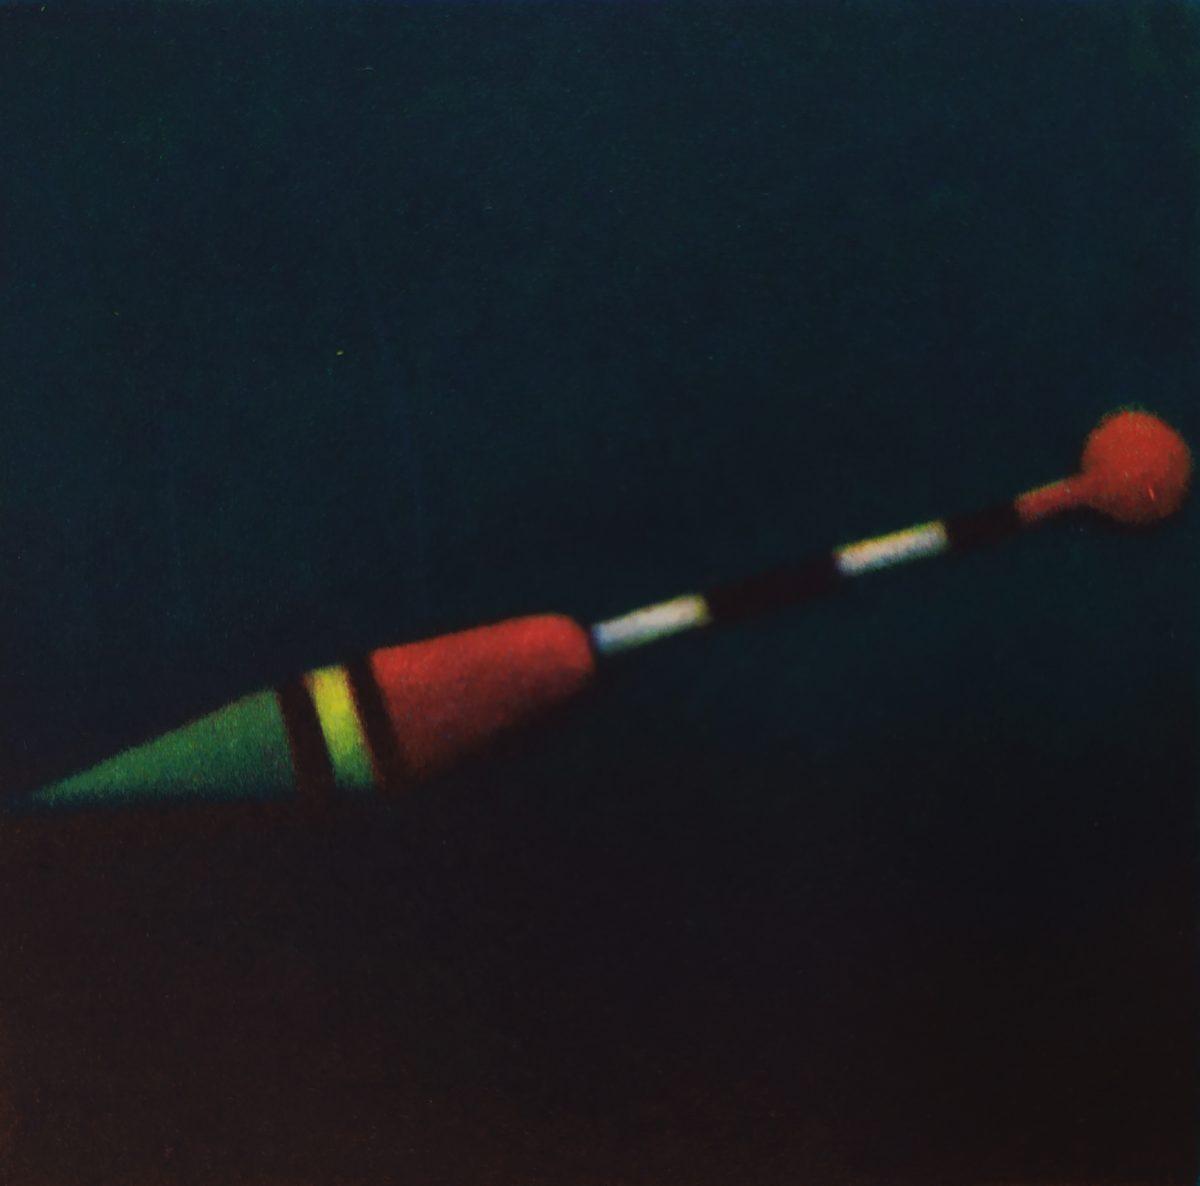 James McCreary, Float